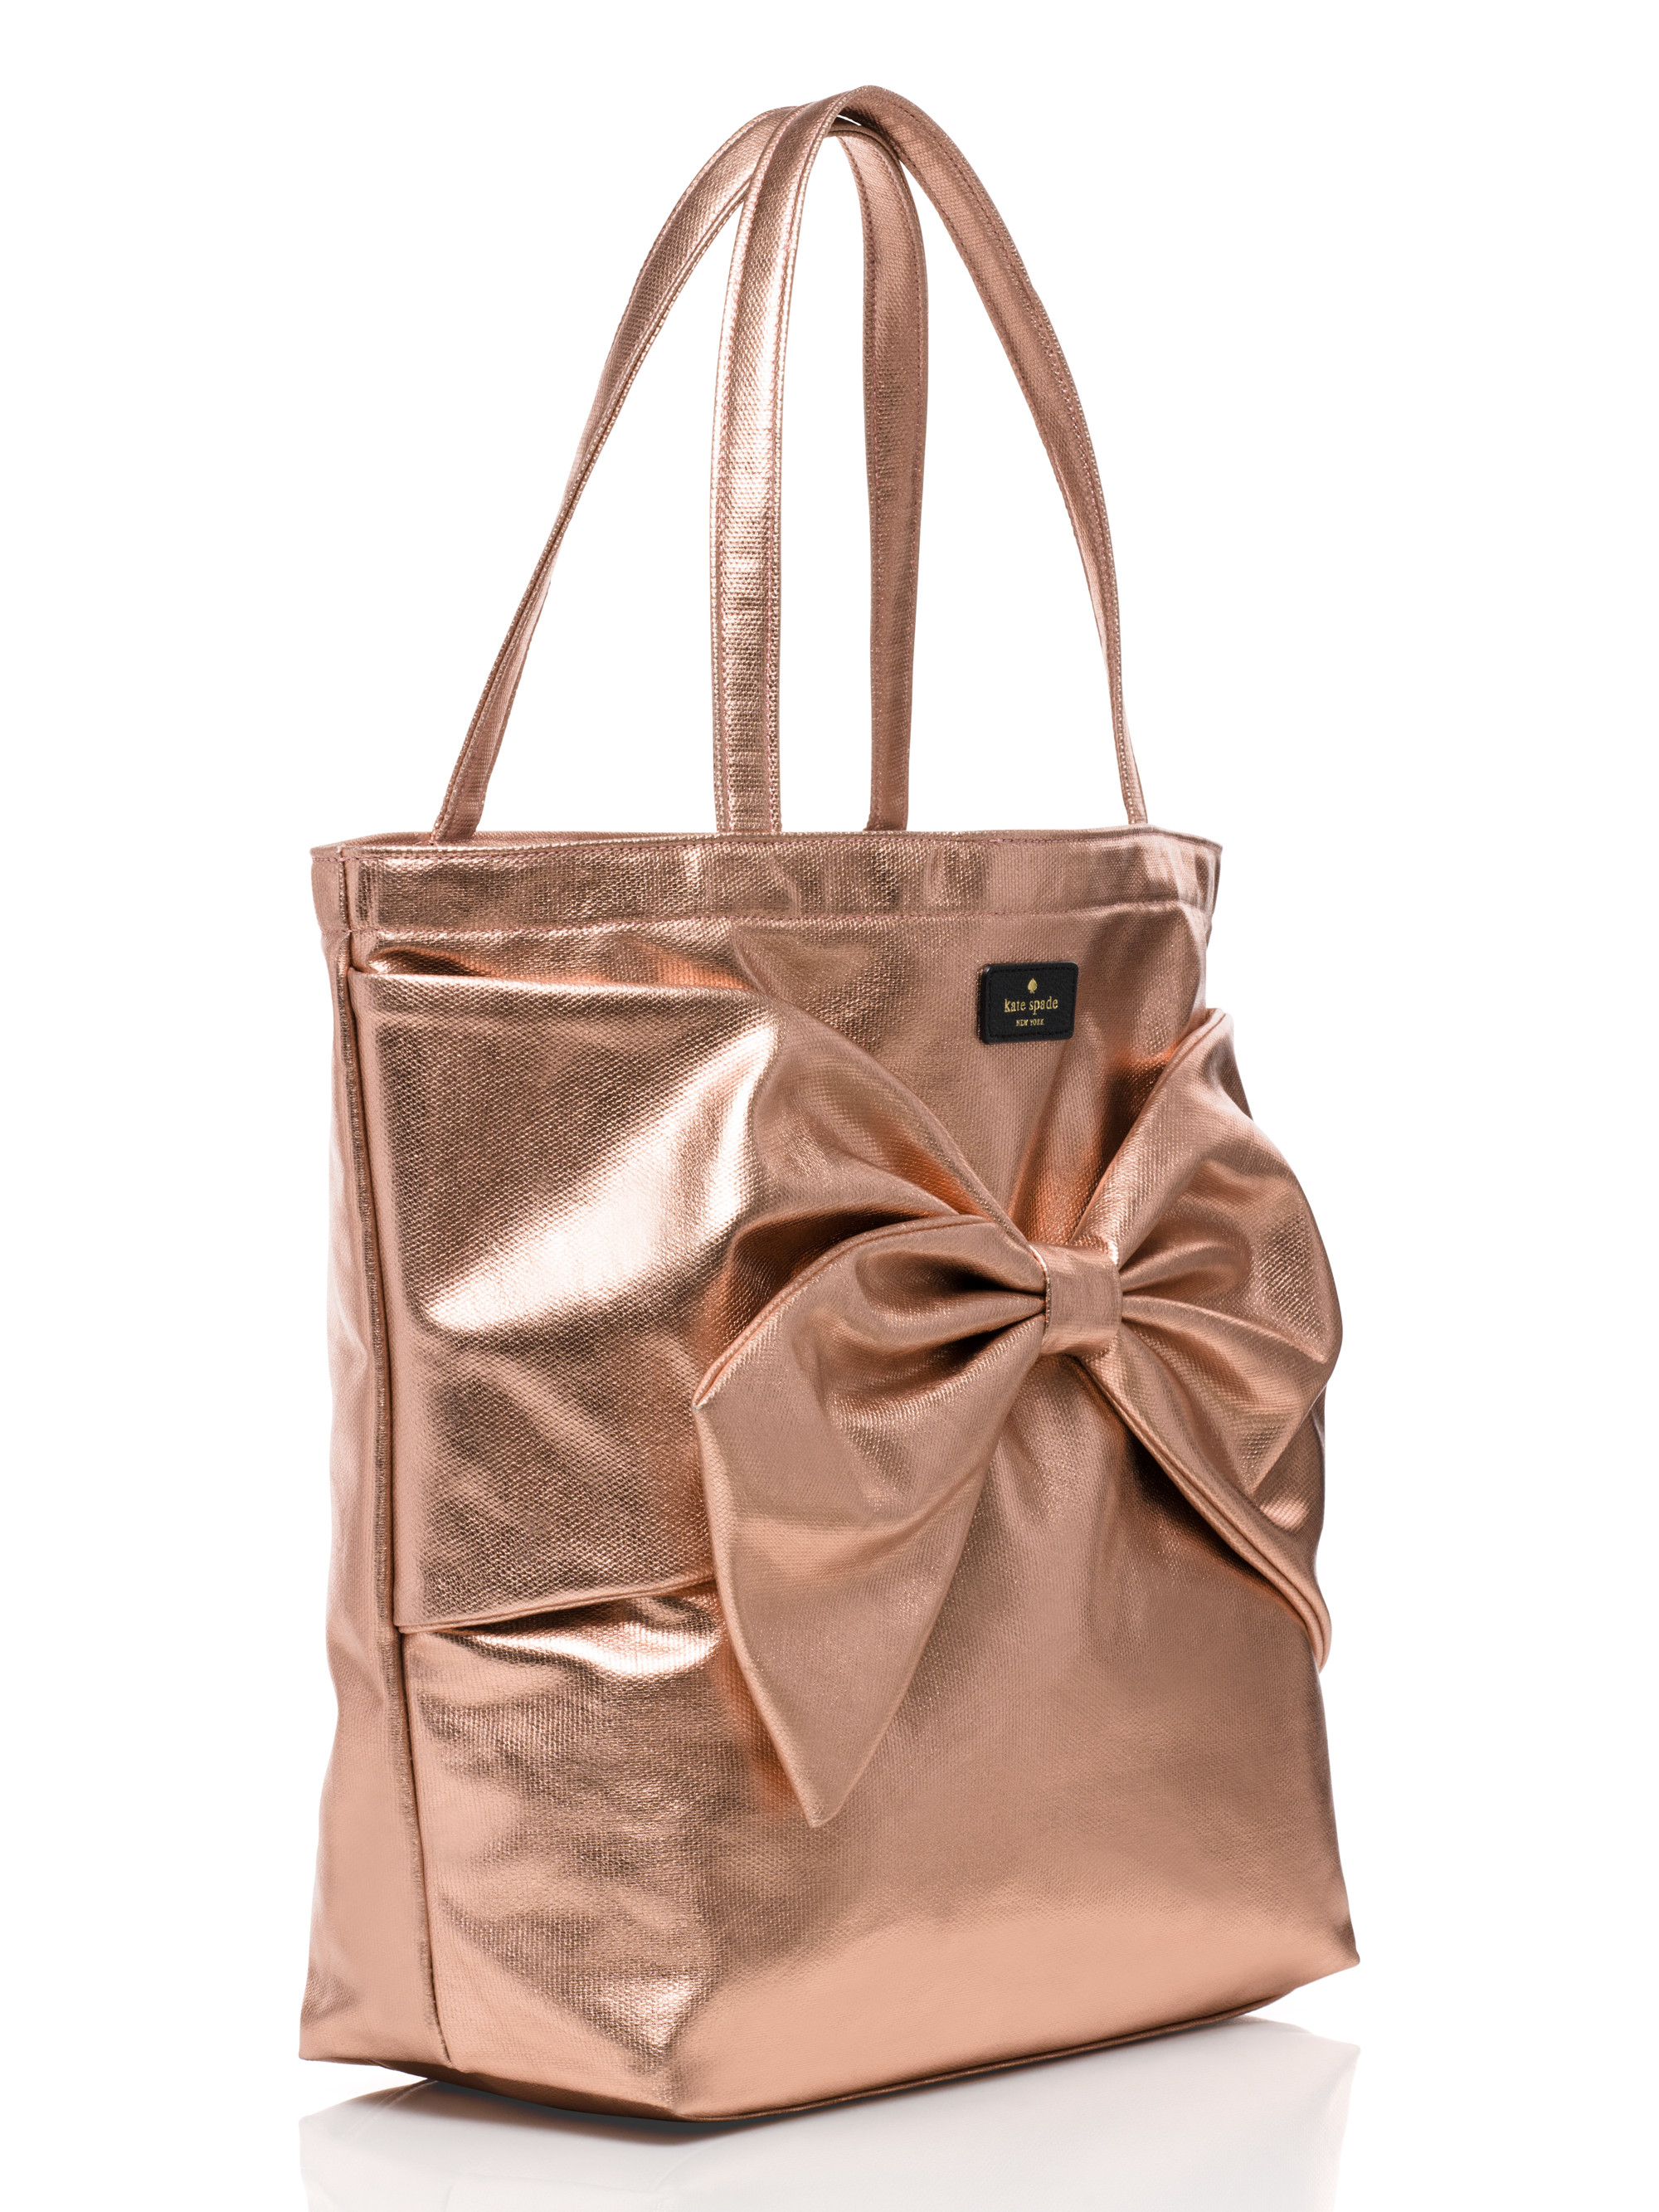 9604dc136d0 Lyst - Kate Spade On Purpose Rose Gold Metallic Tote in Pink